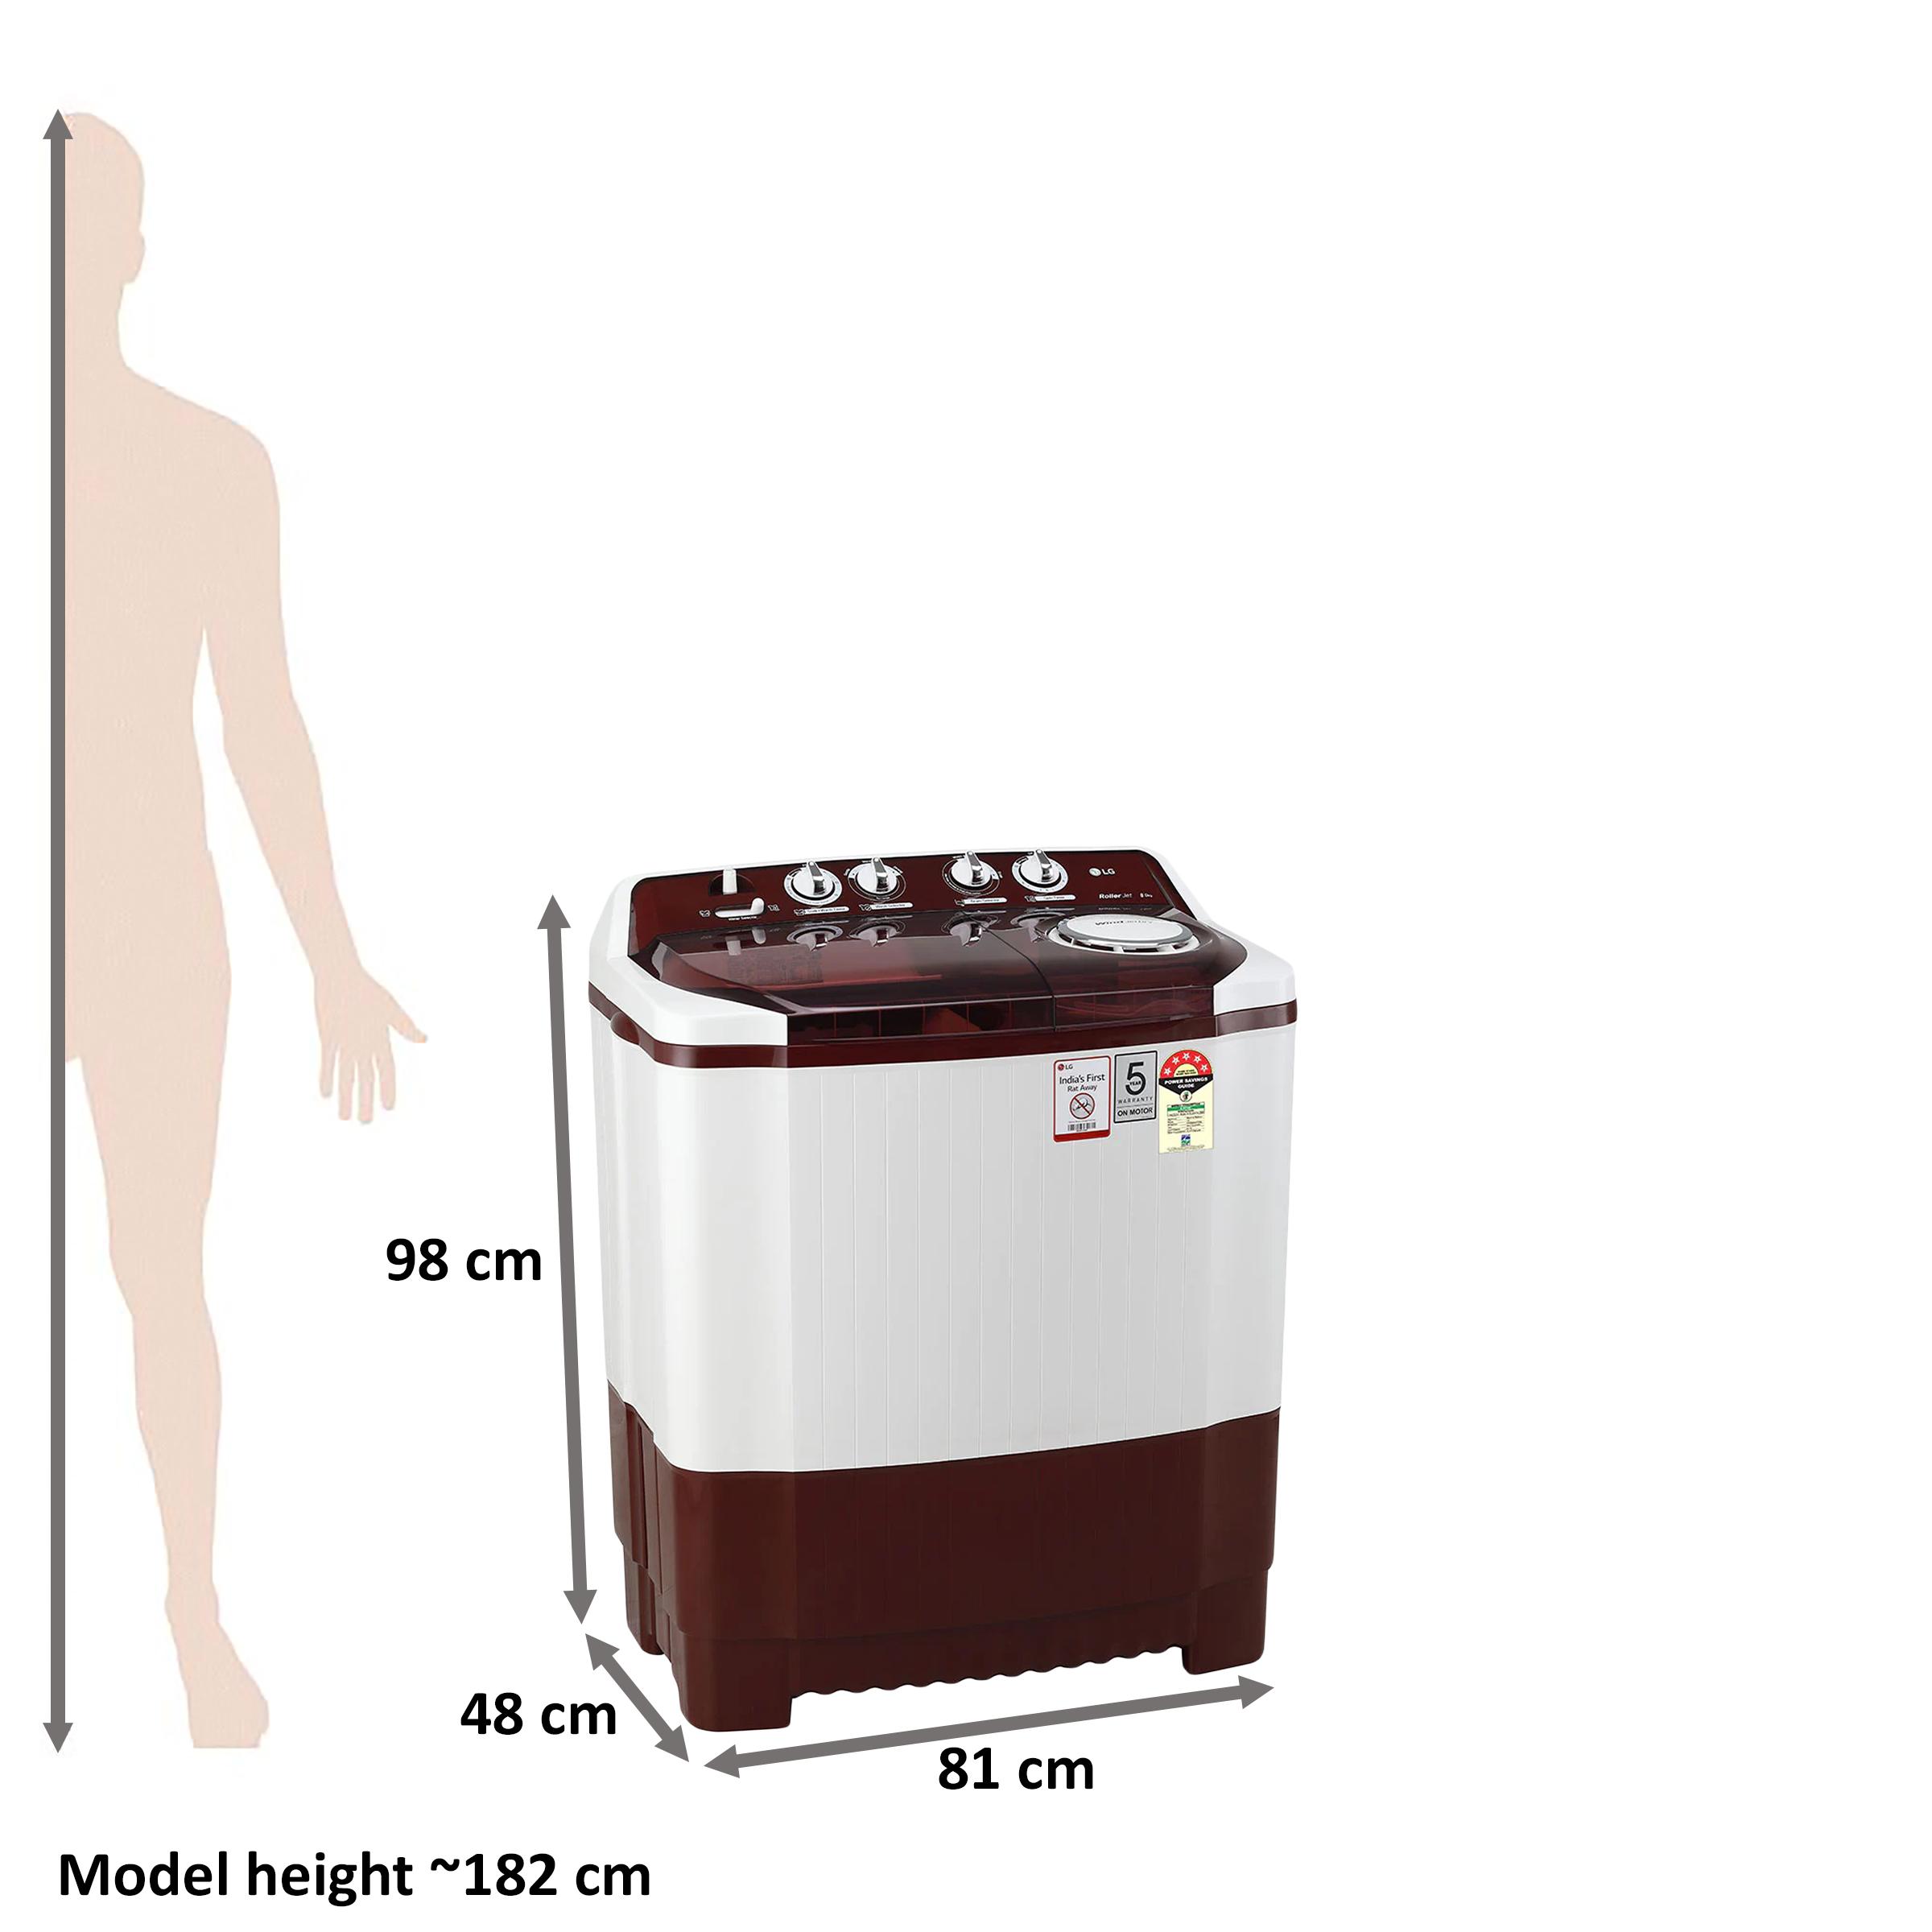 LG 8 kg 5 Star Semi-Automatic Top Load Washing Machine (Auto Restart, P8035SRMZ.ABGQEIL, Burgundy)_2